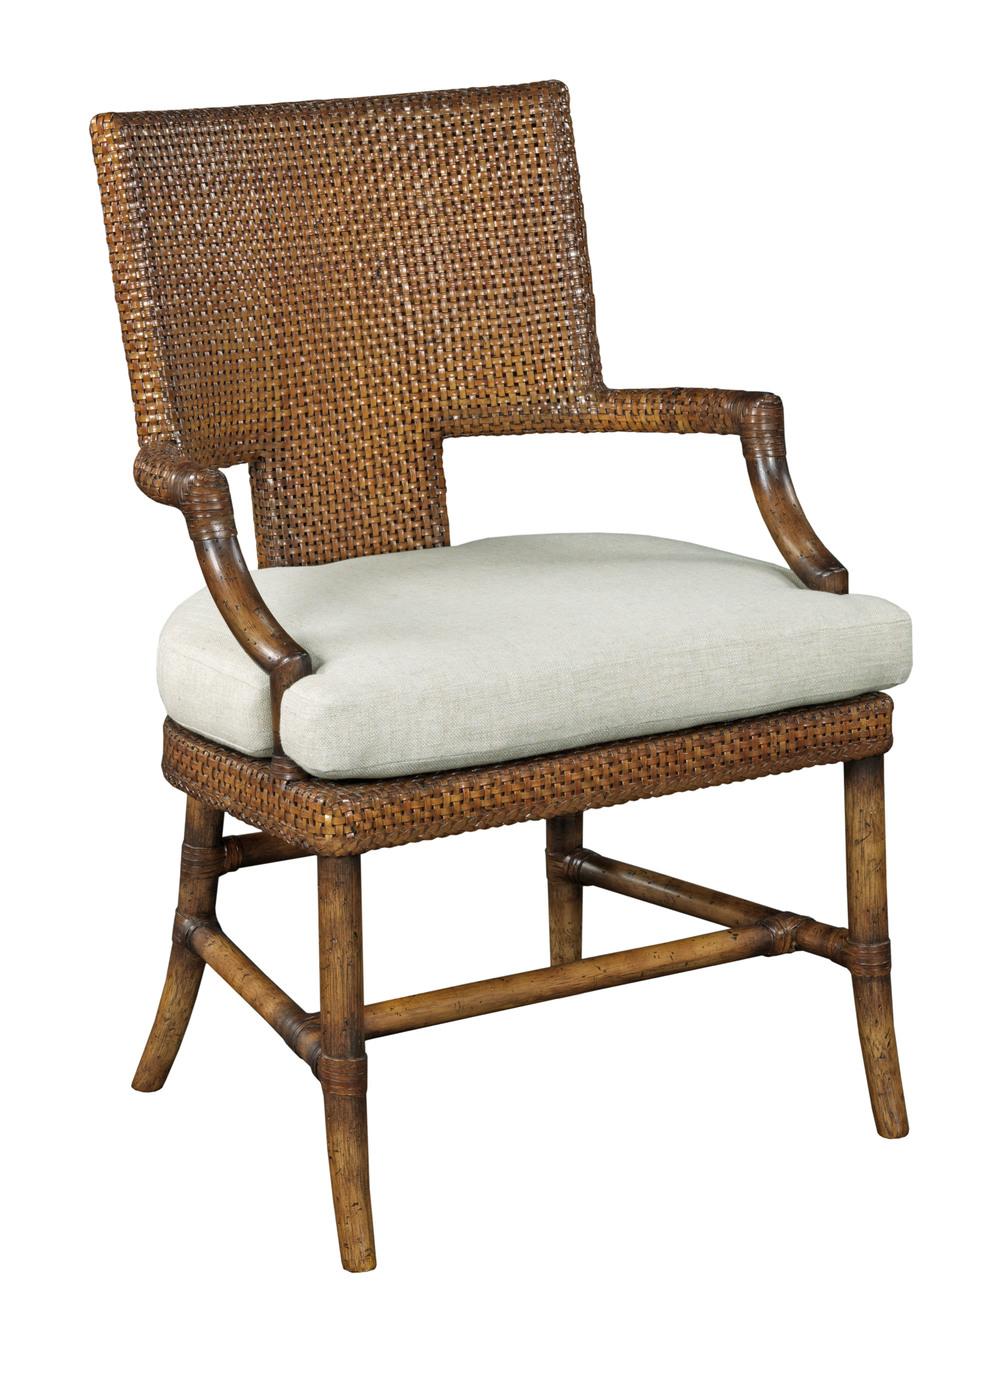 Woodbridge Furniture Company - Klismos Chair